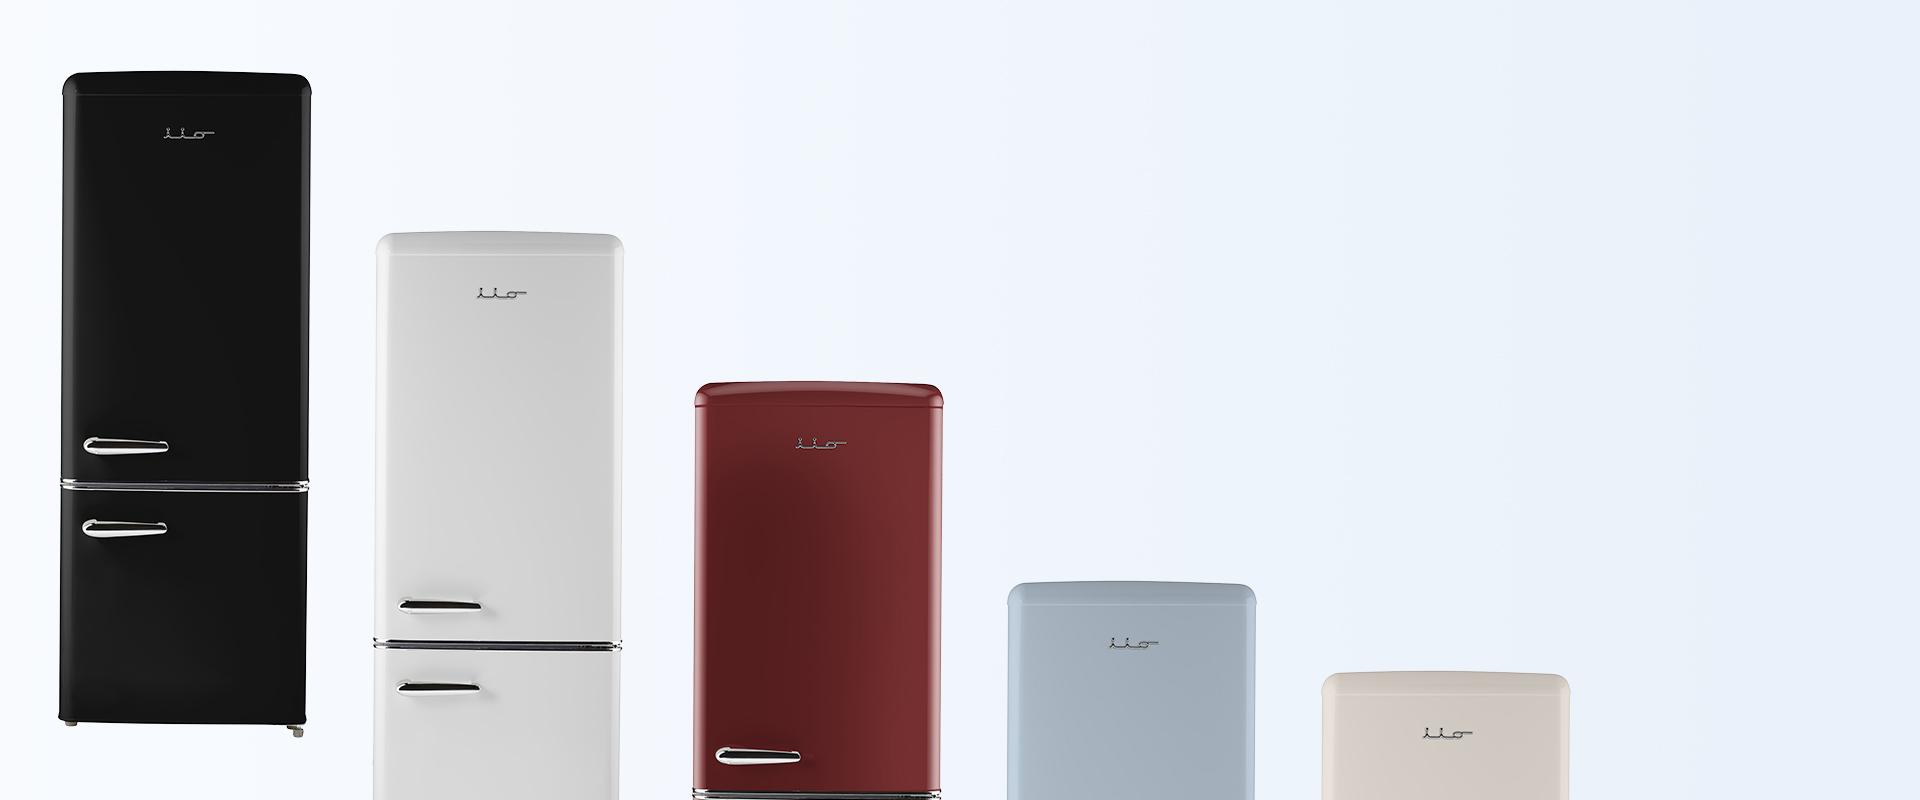 energy efficient retro refrigerators